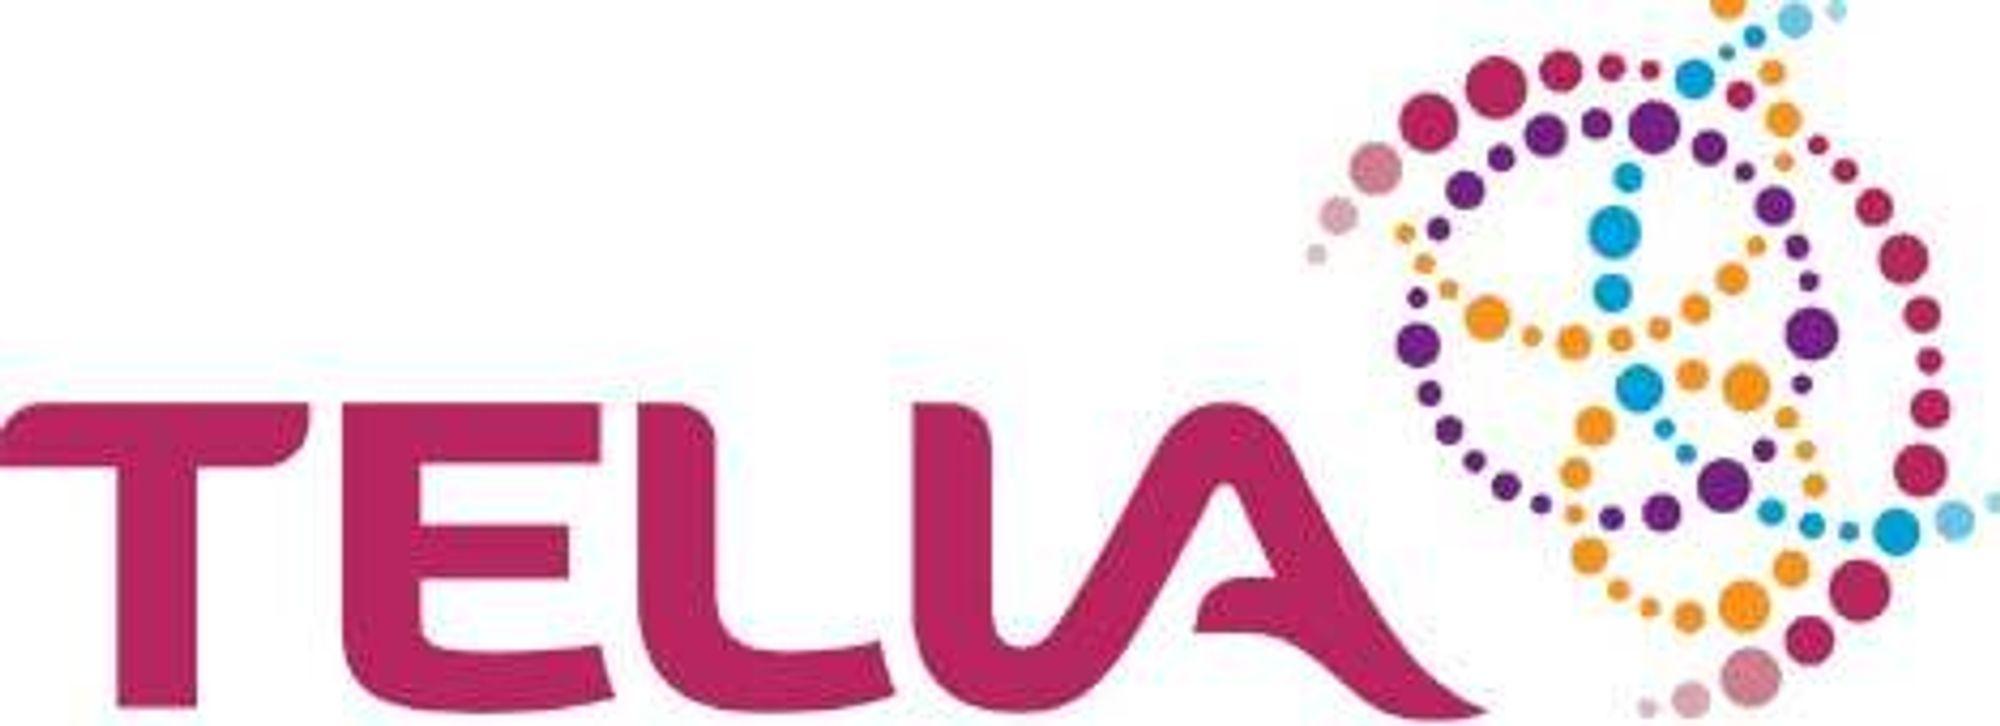 Telia Sonera logo 2004